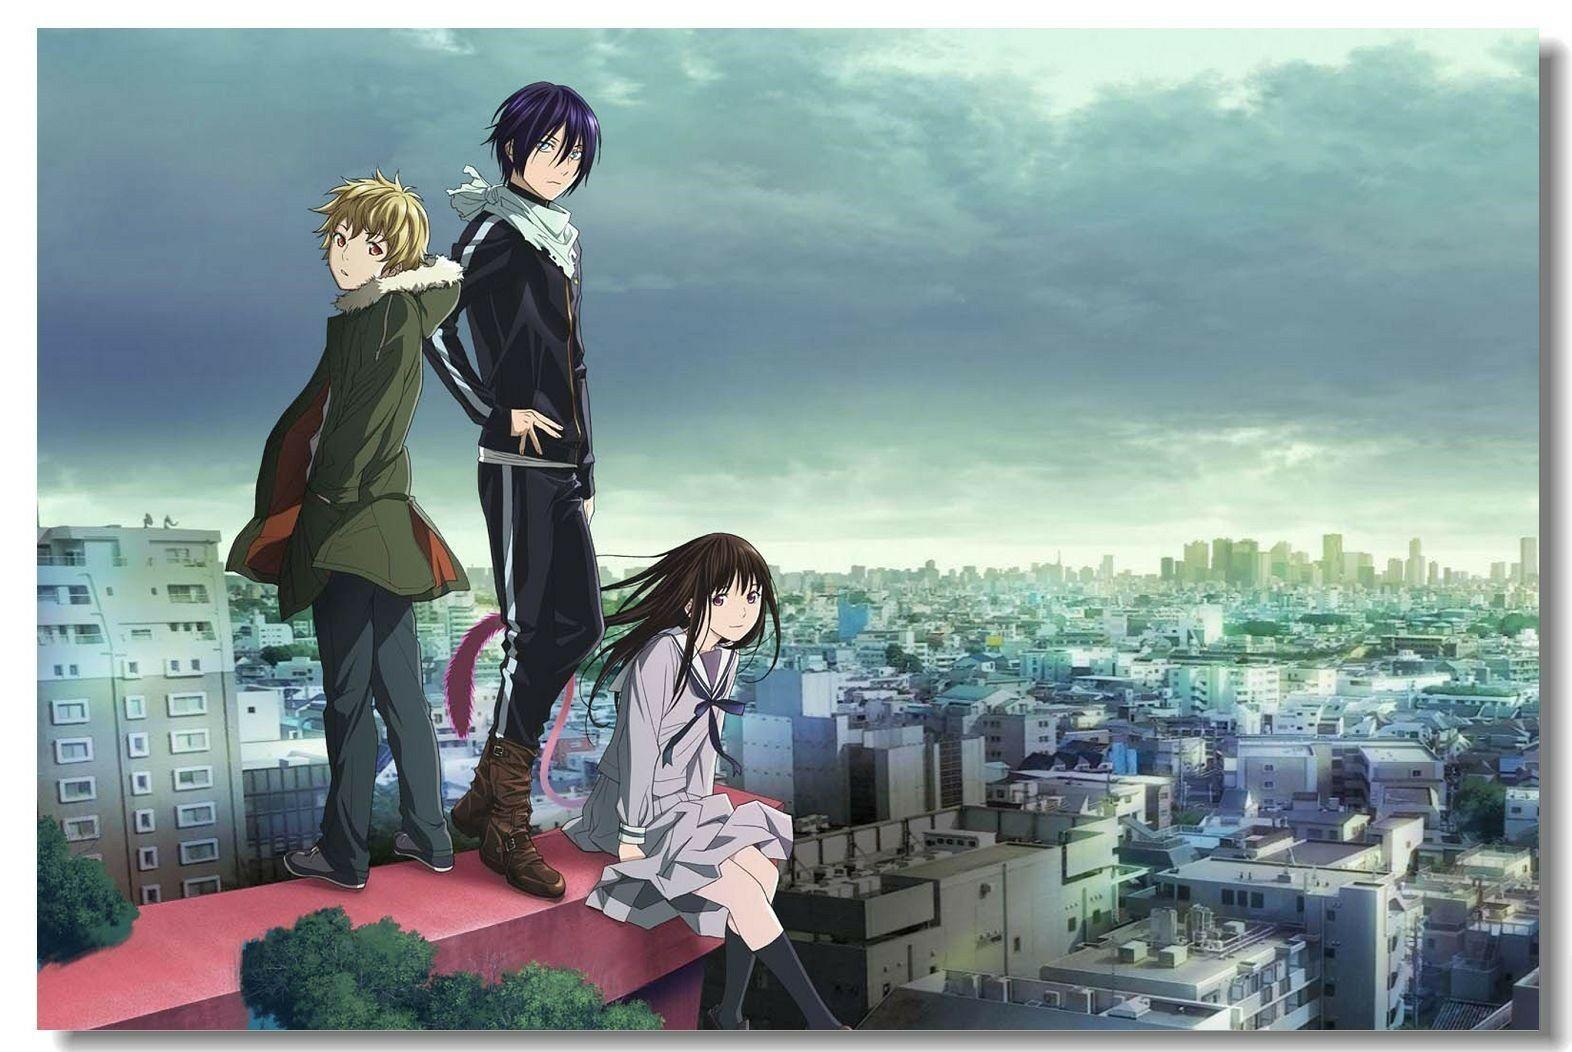 Poster Code Geass Japan Anime Boy Room Club Wall Cloth Print 33